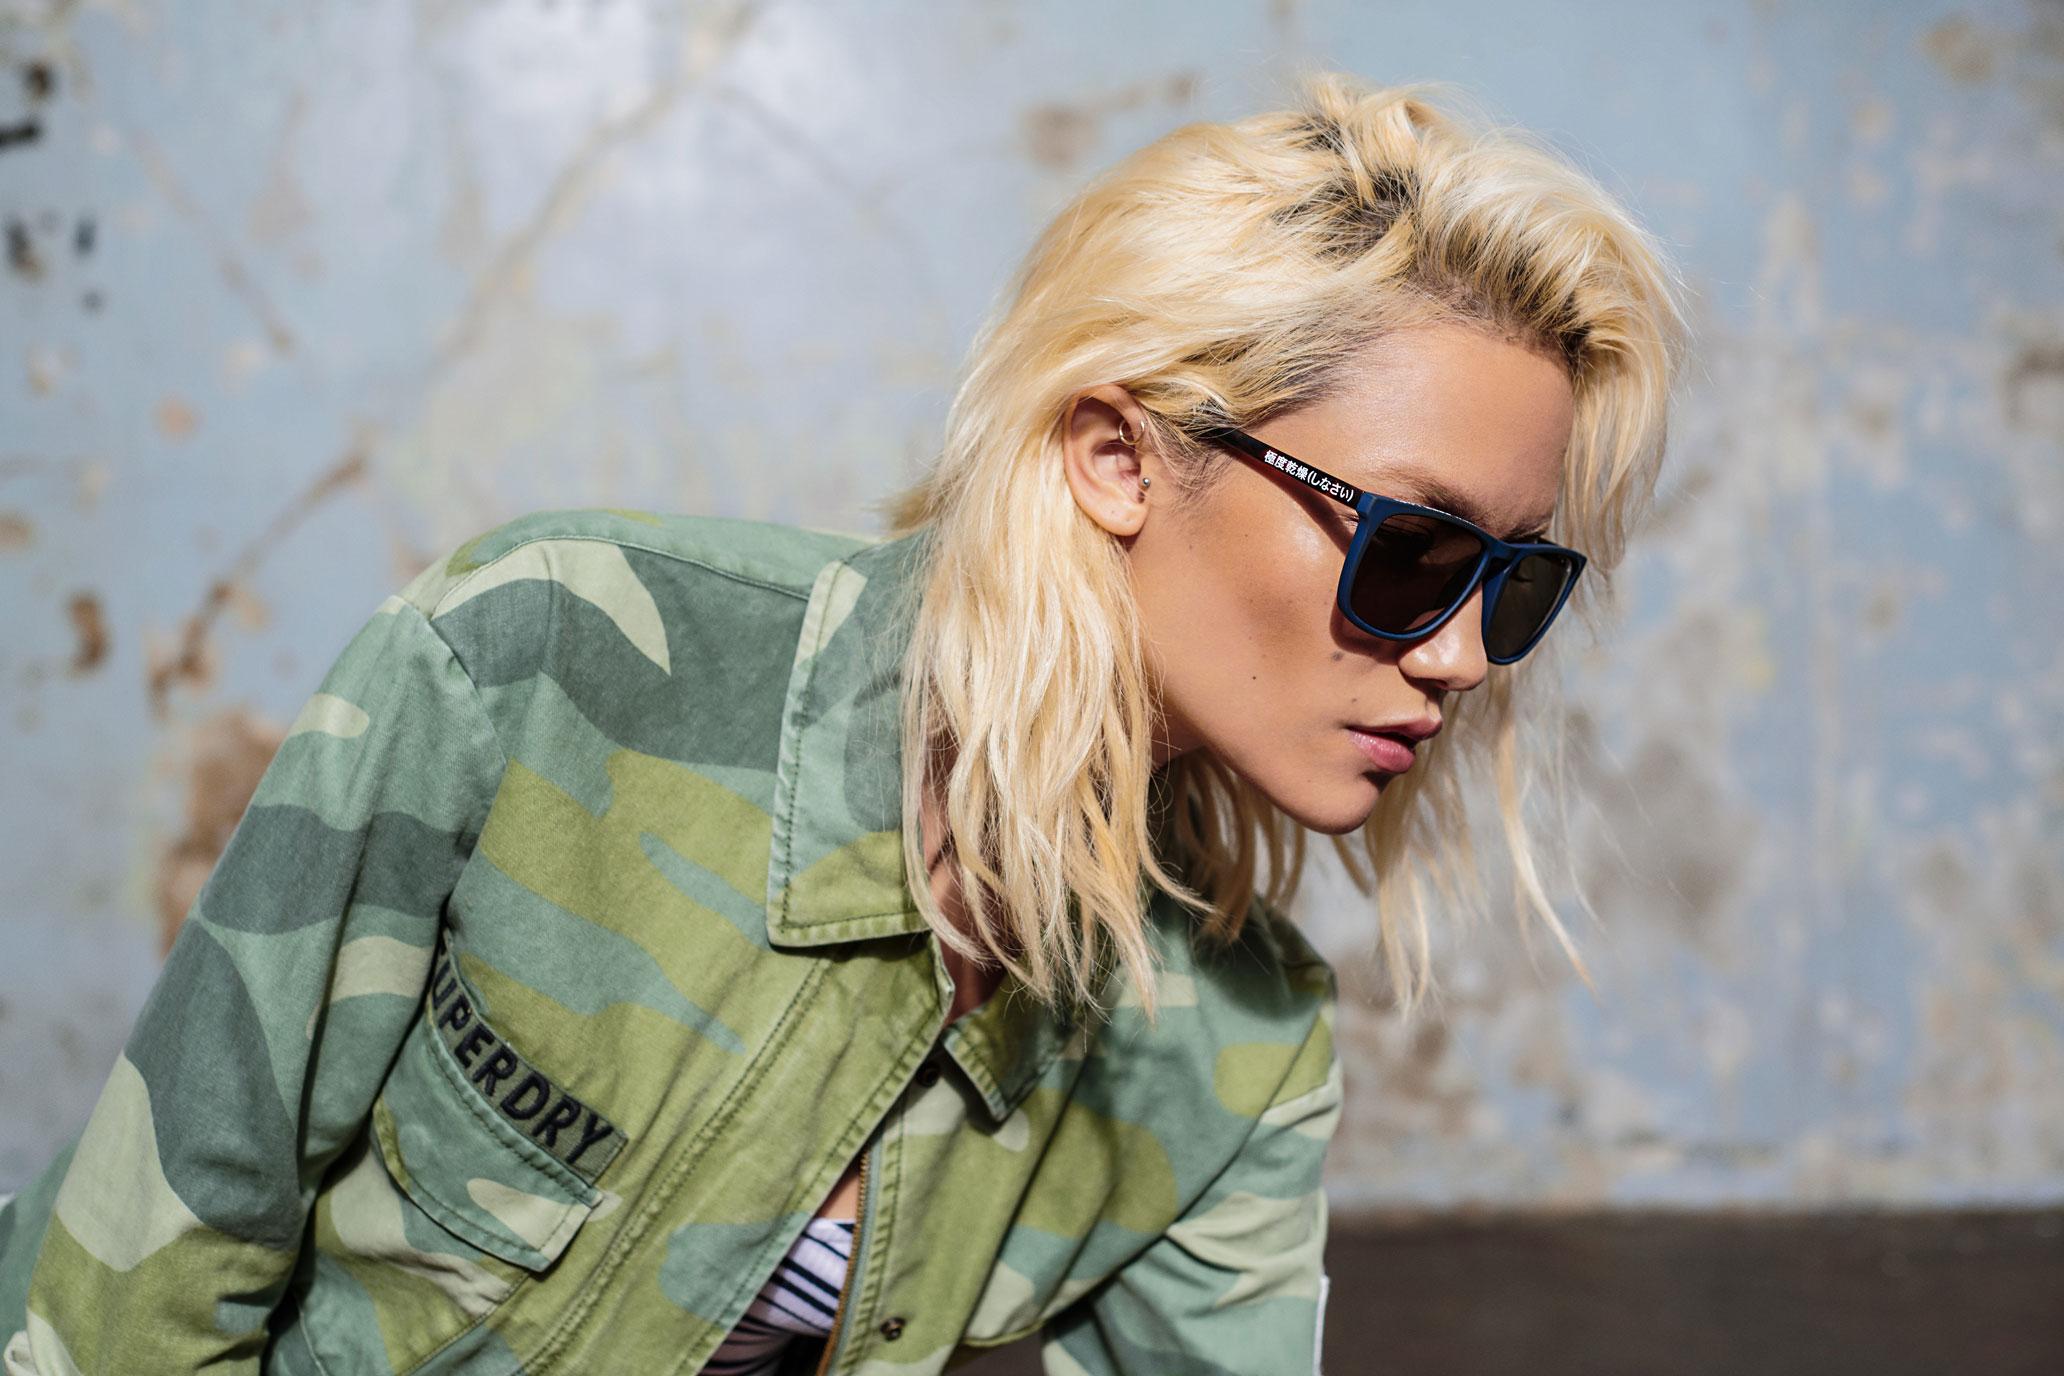 superdry-sunglasses_brand-advert.jpg